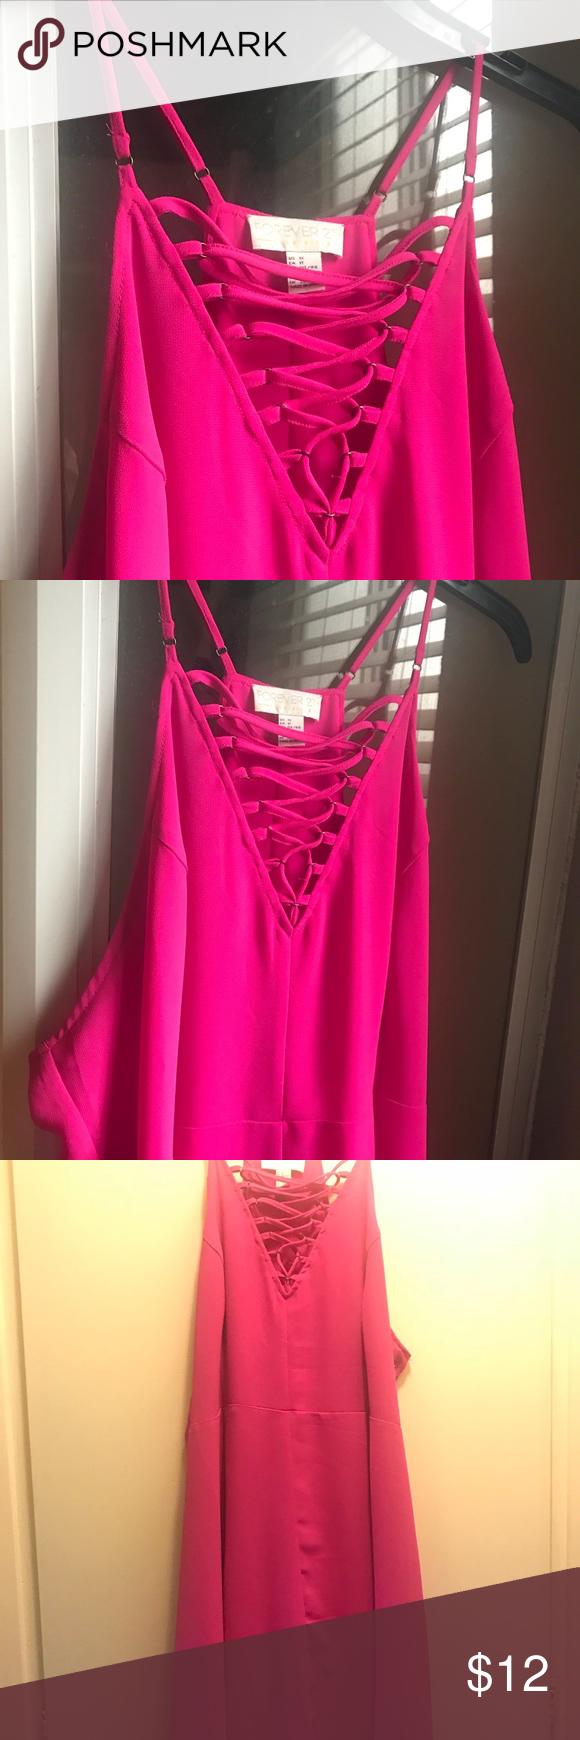 Hot pink color dress  Lace up knee length lace up dress  Online stock st dresses